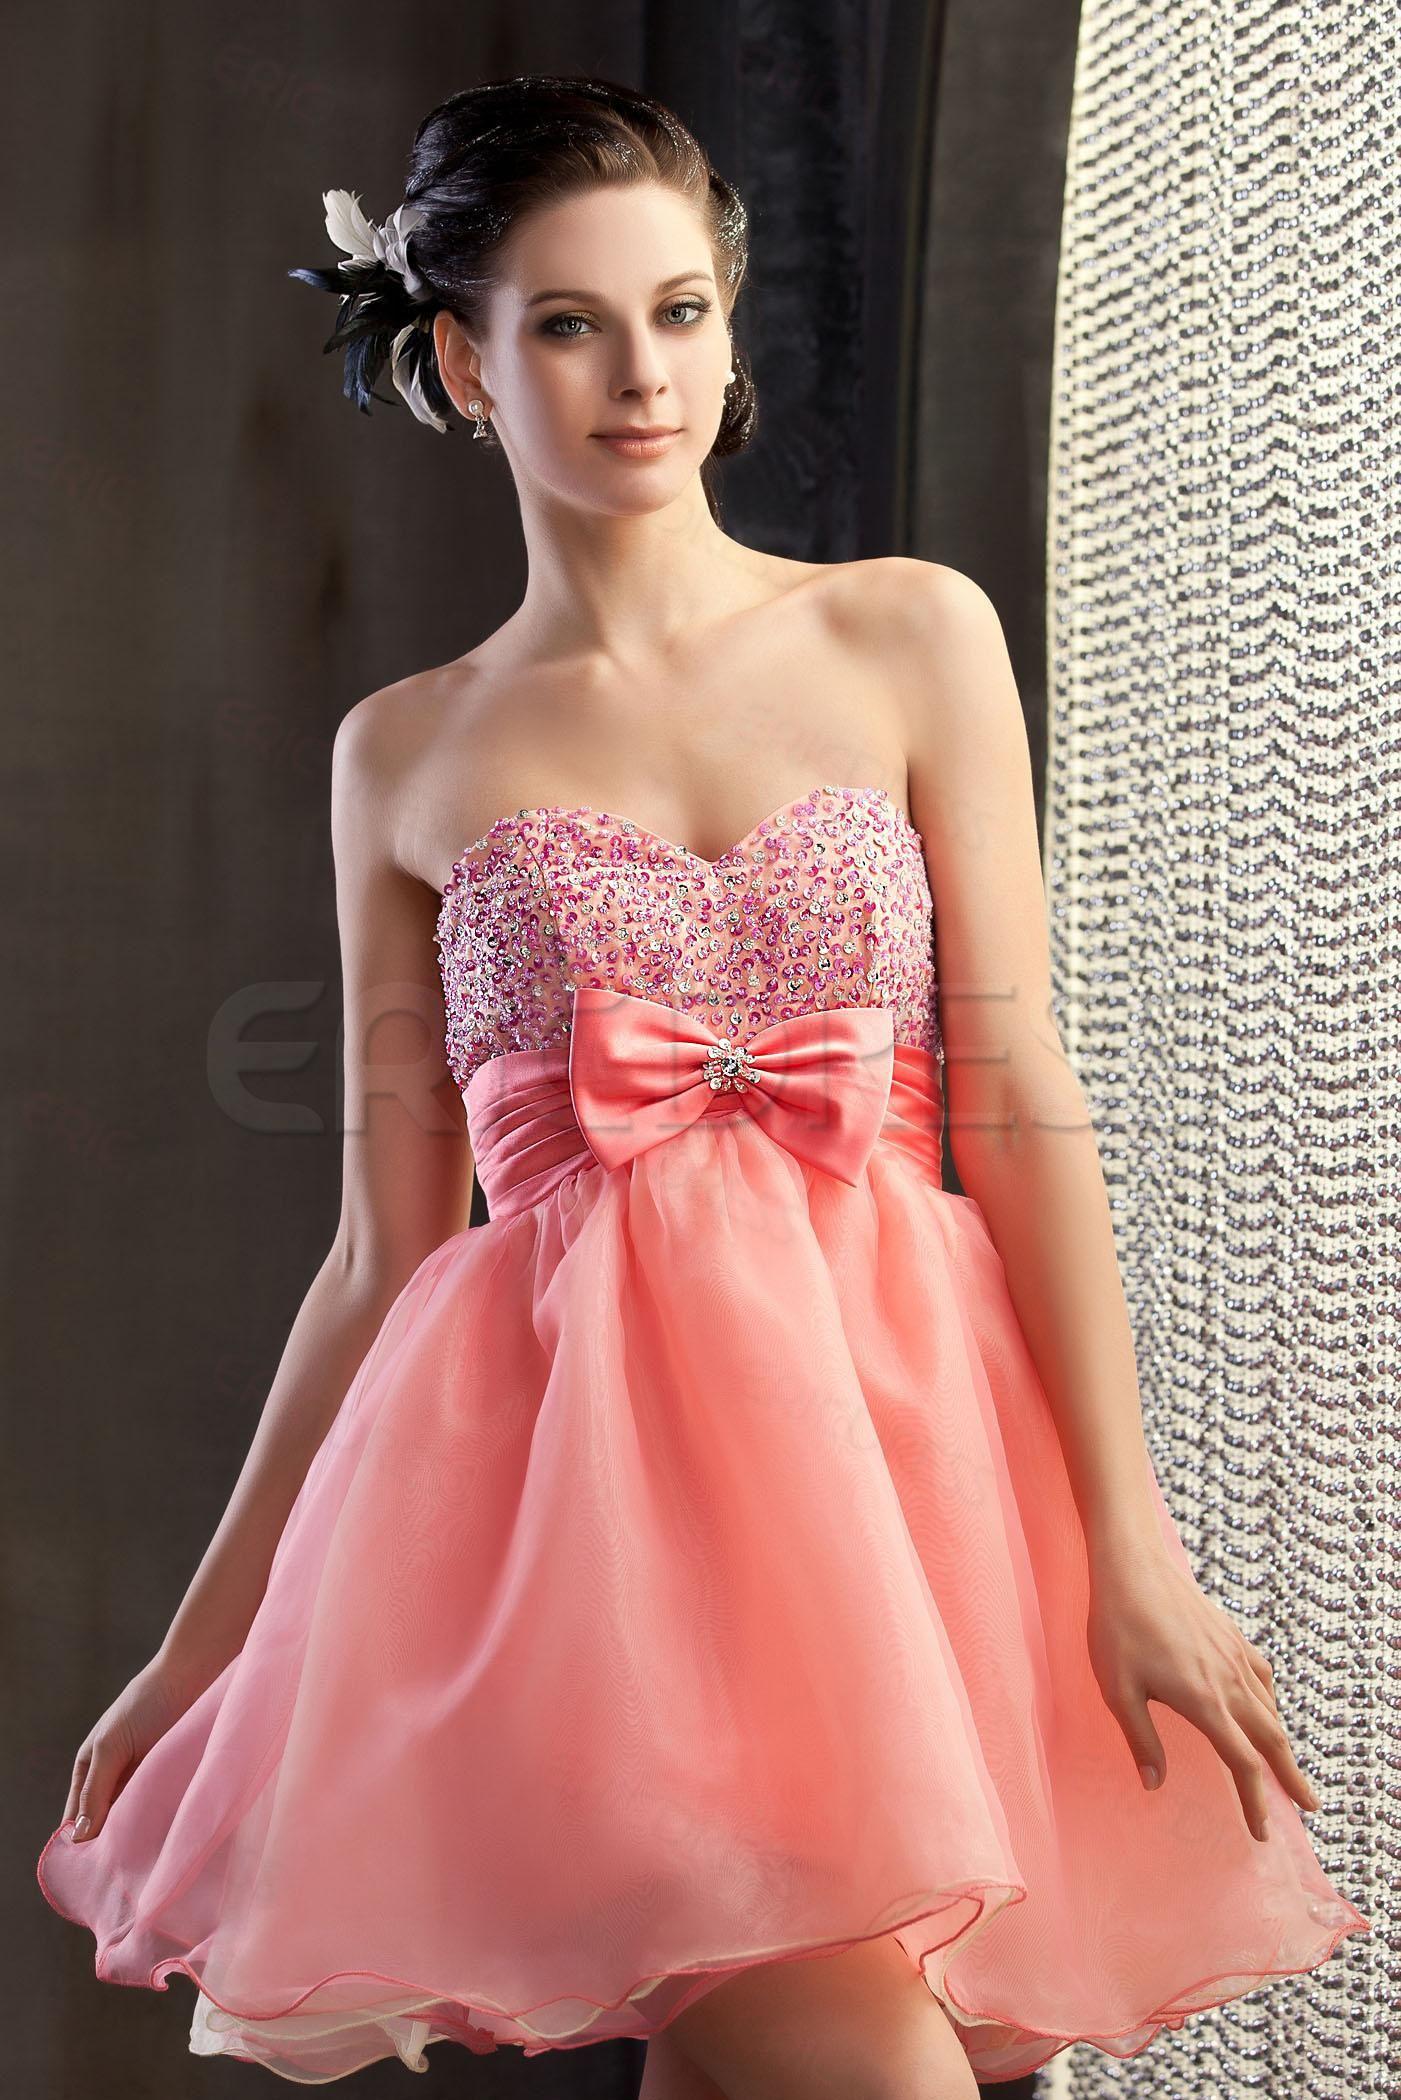 Graceful A-Line Mini-Length Sweetheart Polina's Homecoming/Prom Dress Homecoming Dresses 2014- ericdress.com 9684116